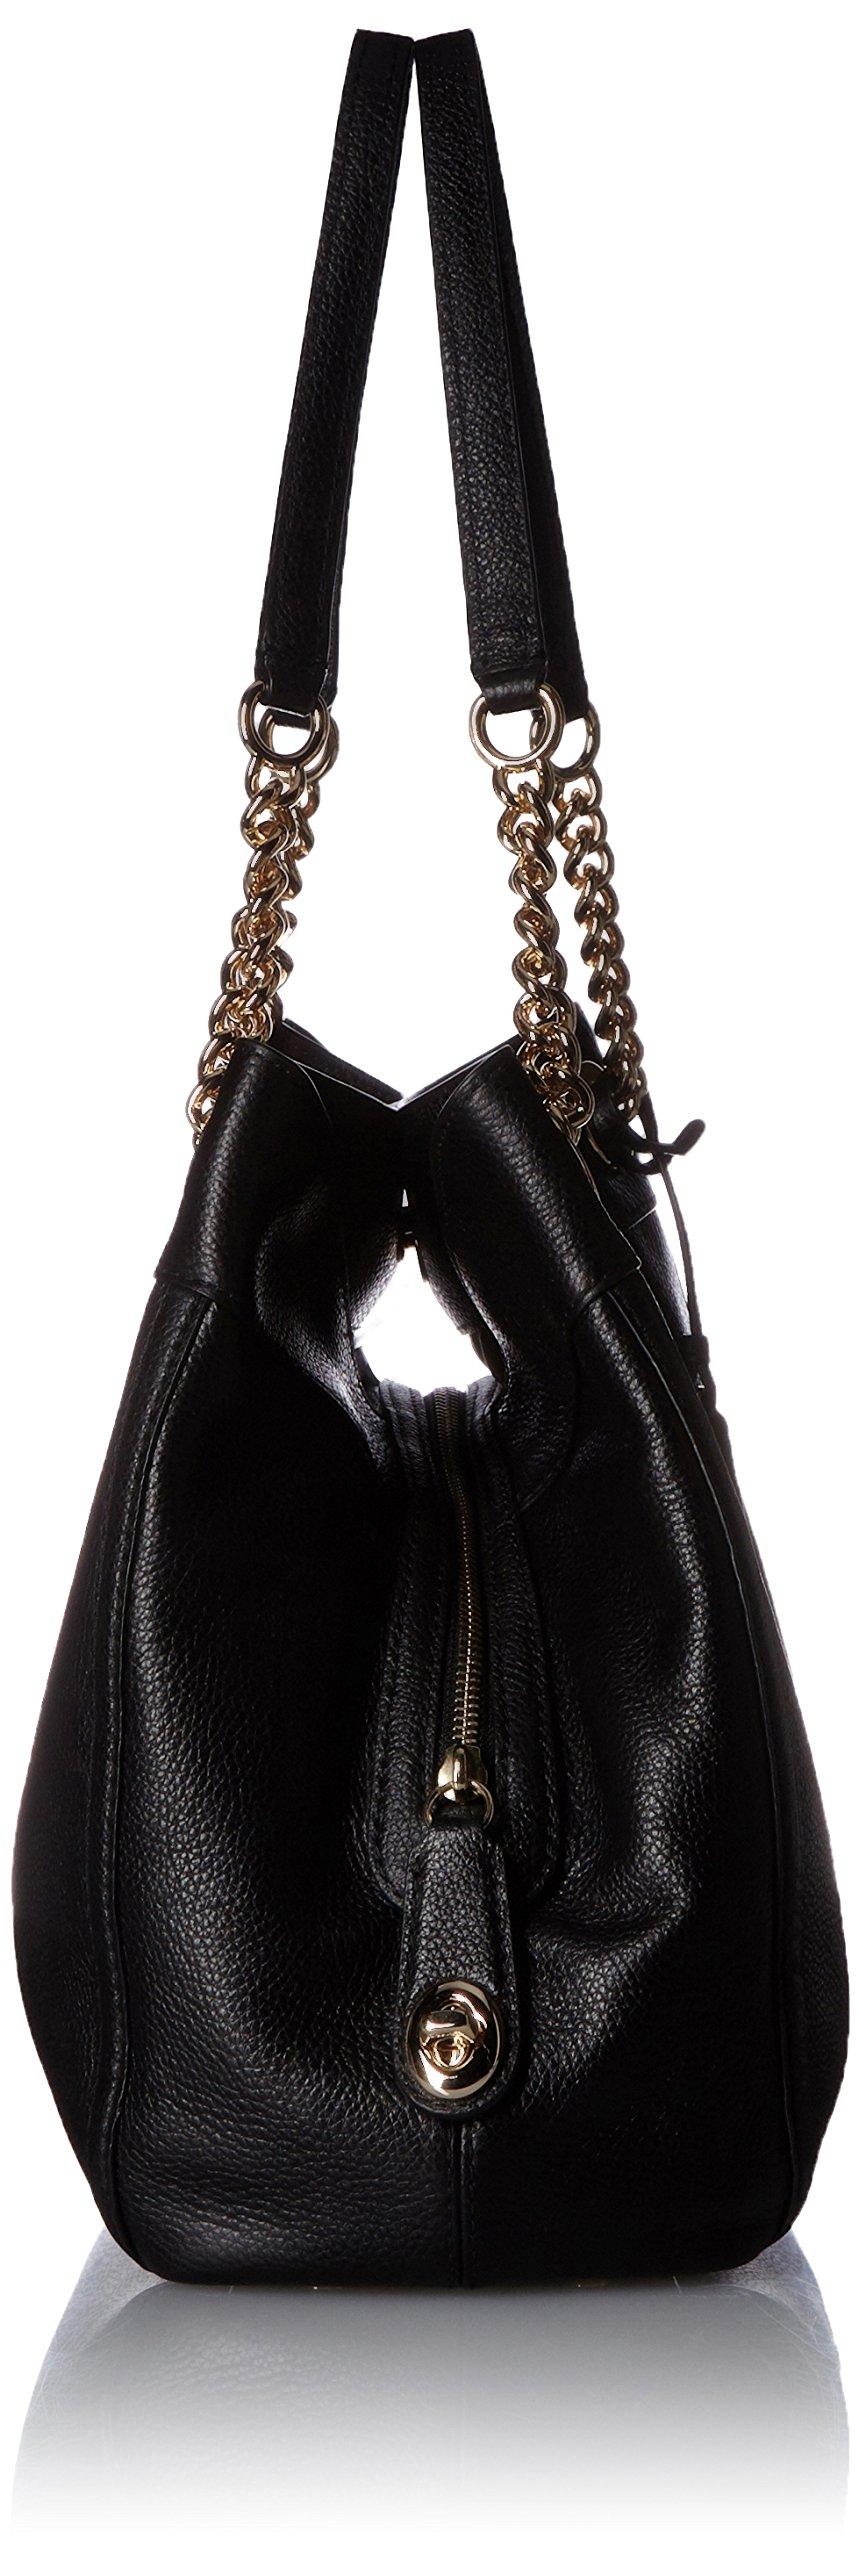 COACH Women's Turnlock Edie LI/Black Shoulder Bag by Coach (Image #3)